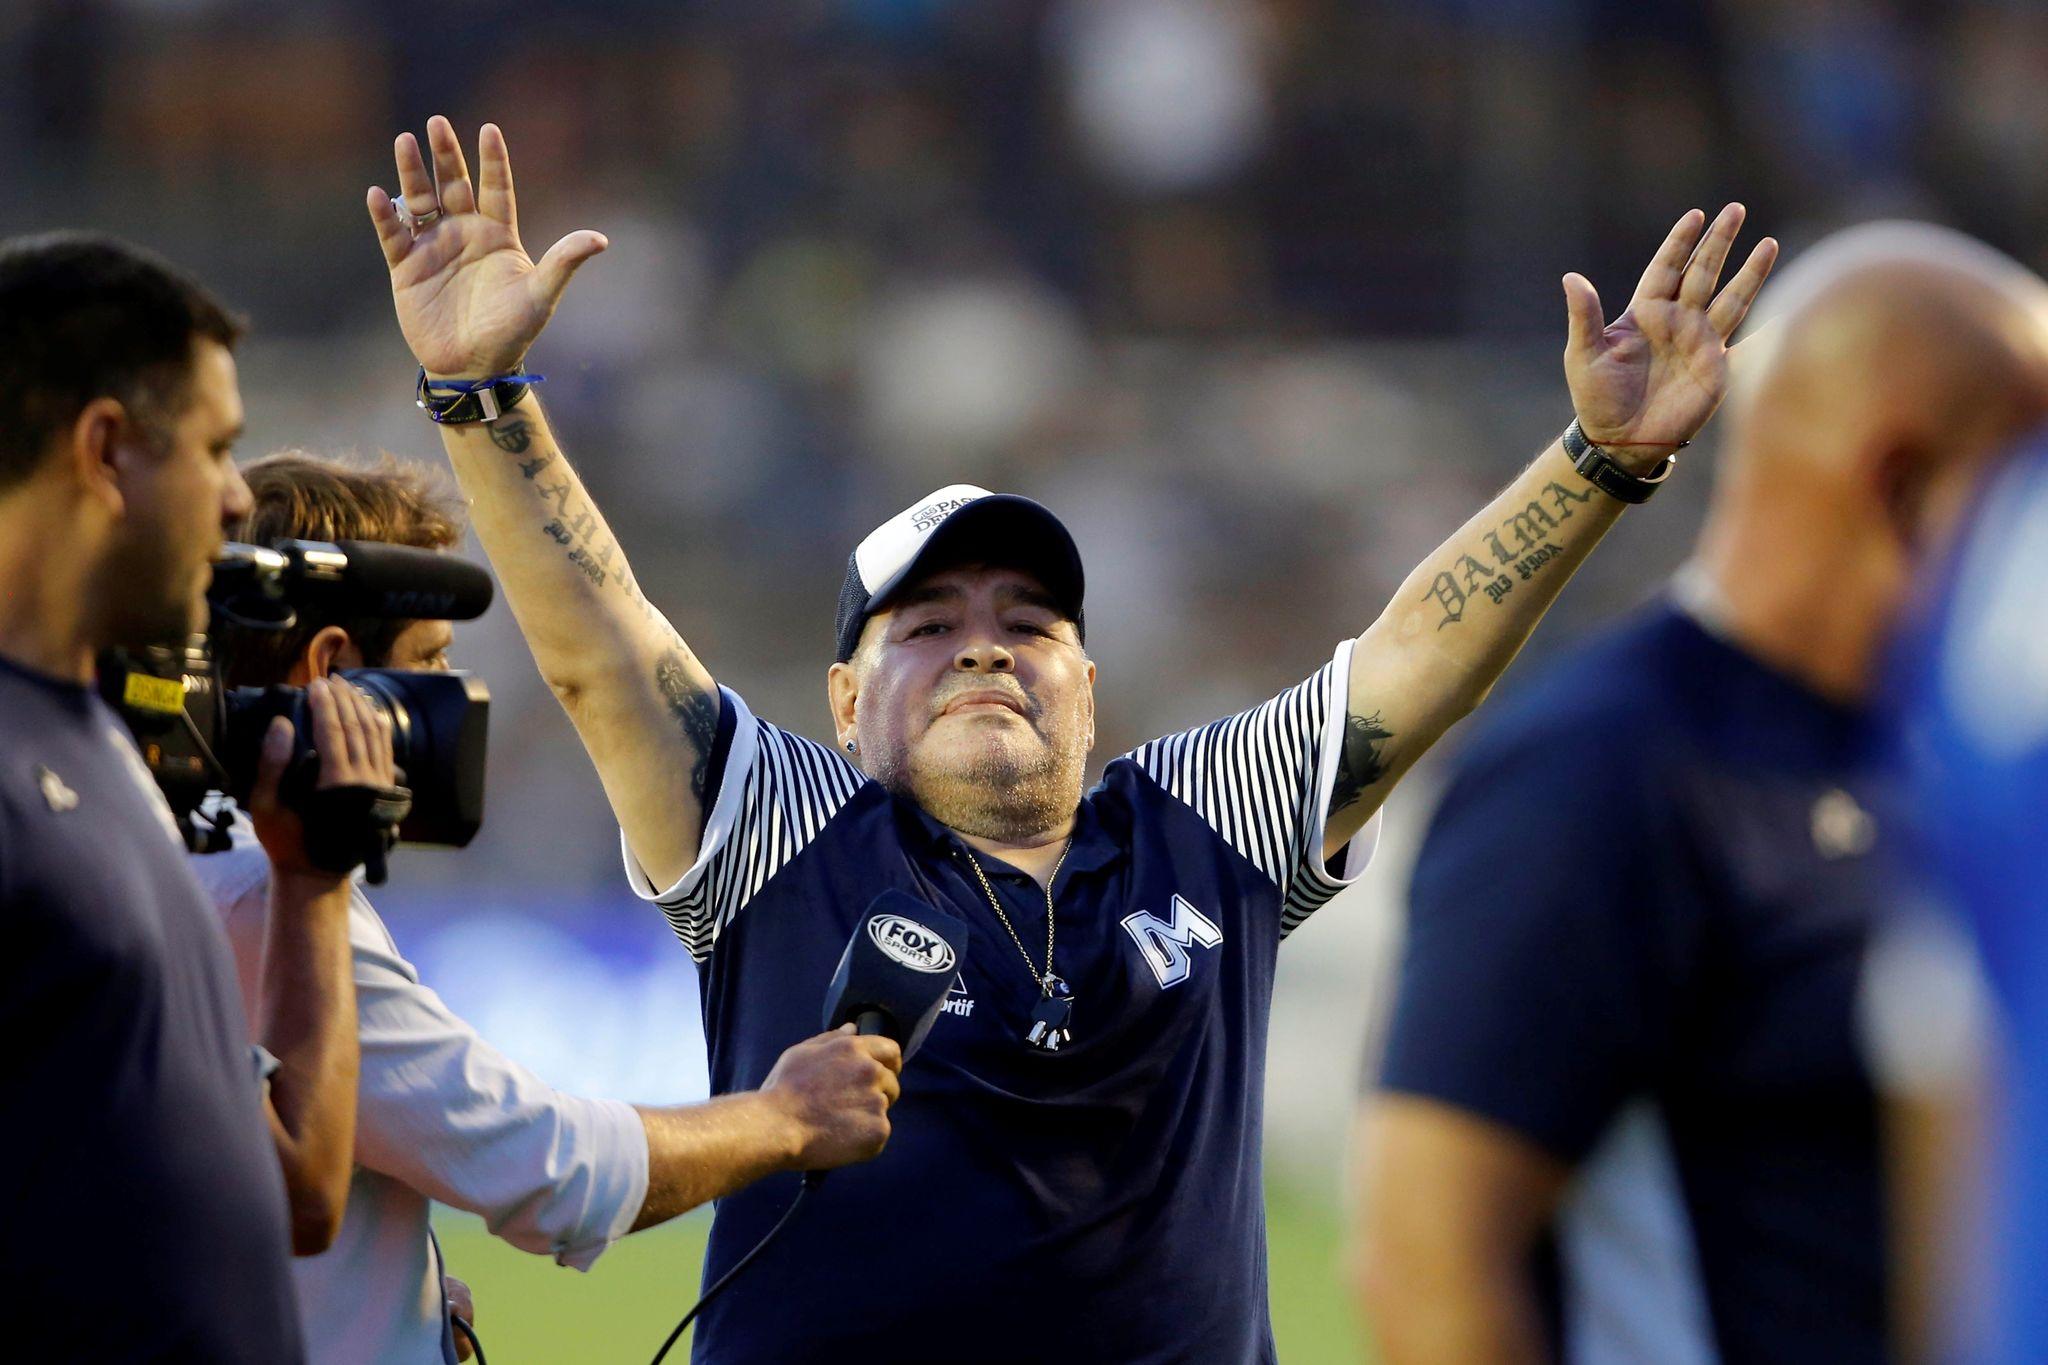 Maradona dies: All the latest reaction